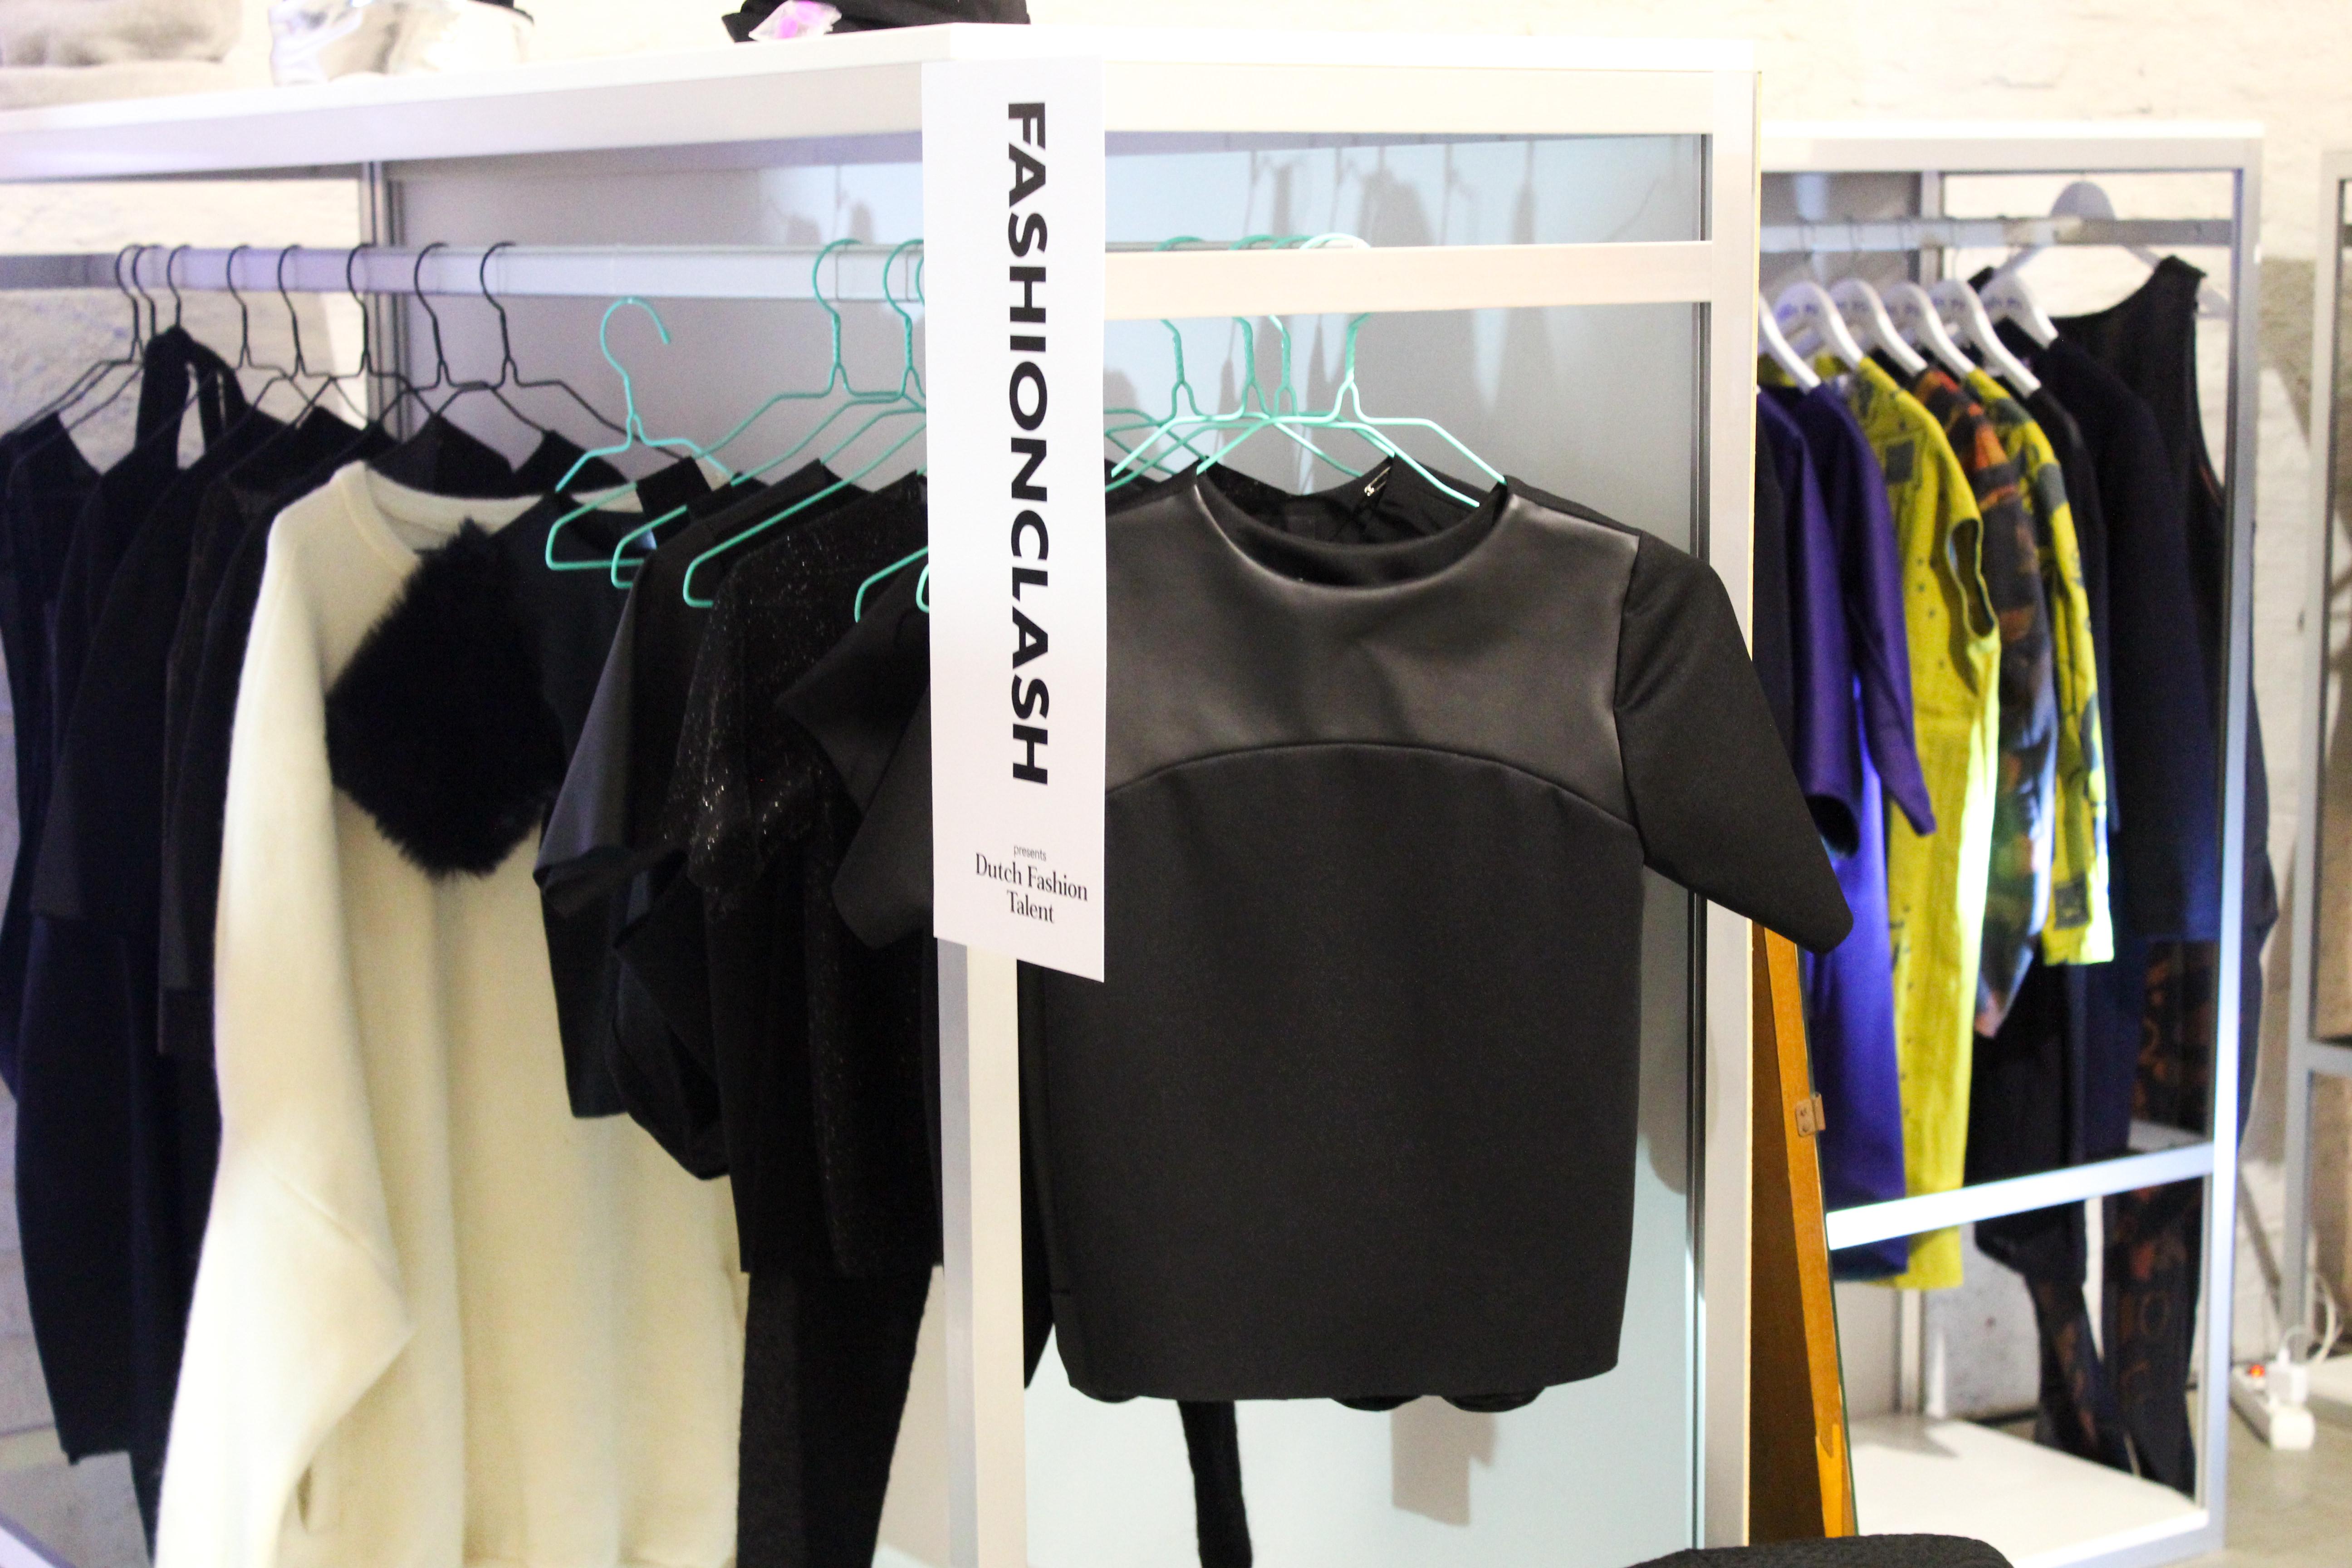 Dutch Fashion Talent - Fashionclash - Cologne Fashion Days